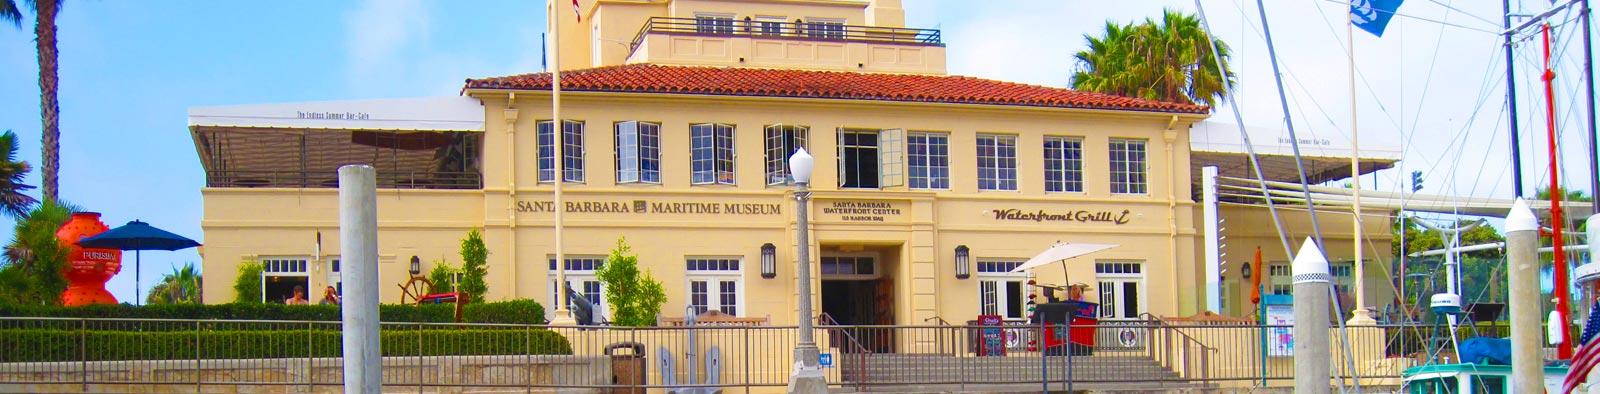 Santa Barbara Maritime Museum Facade